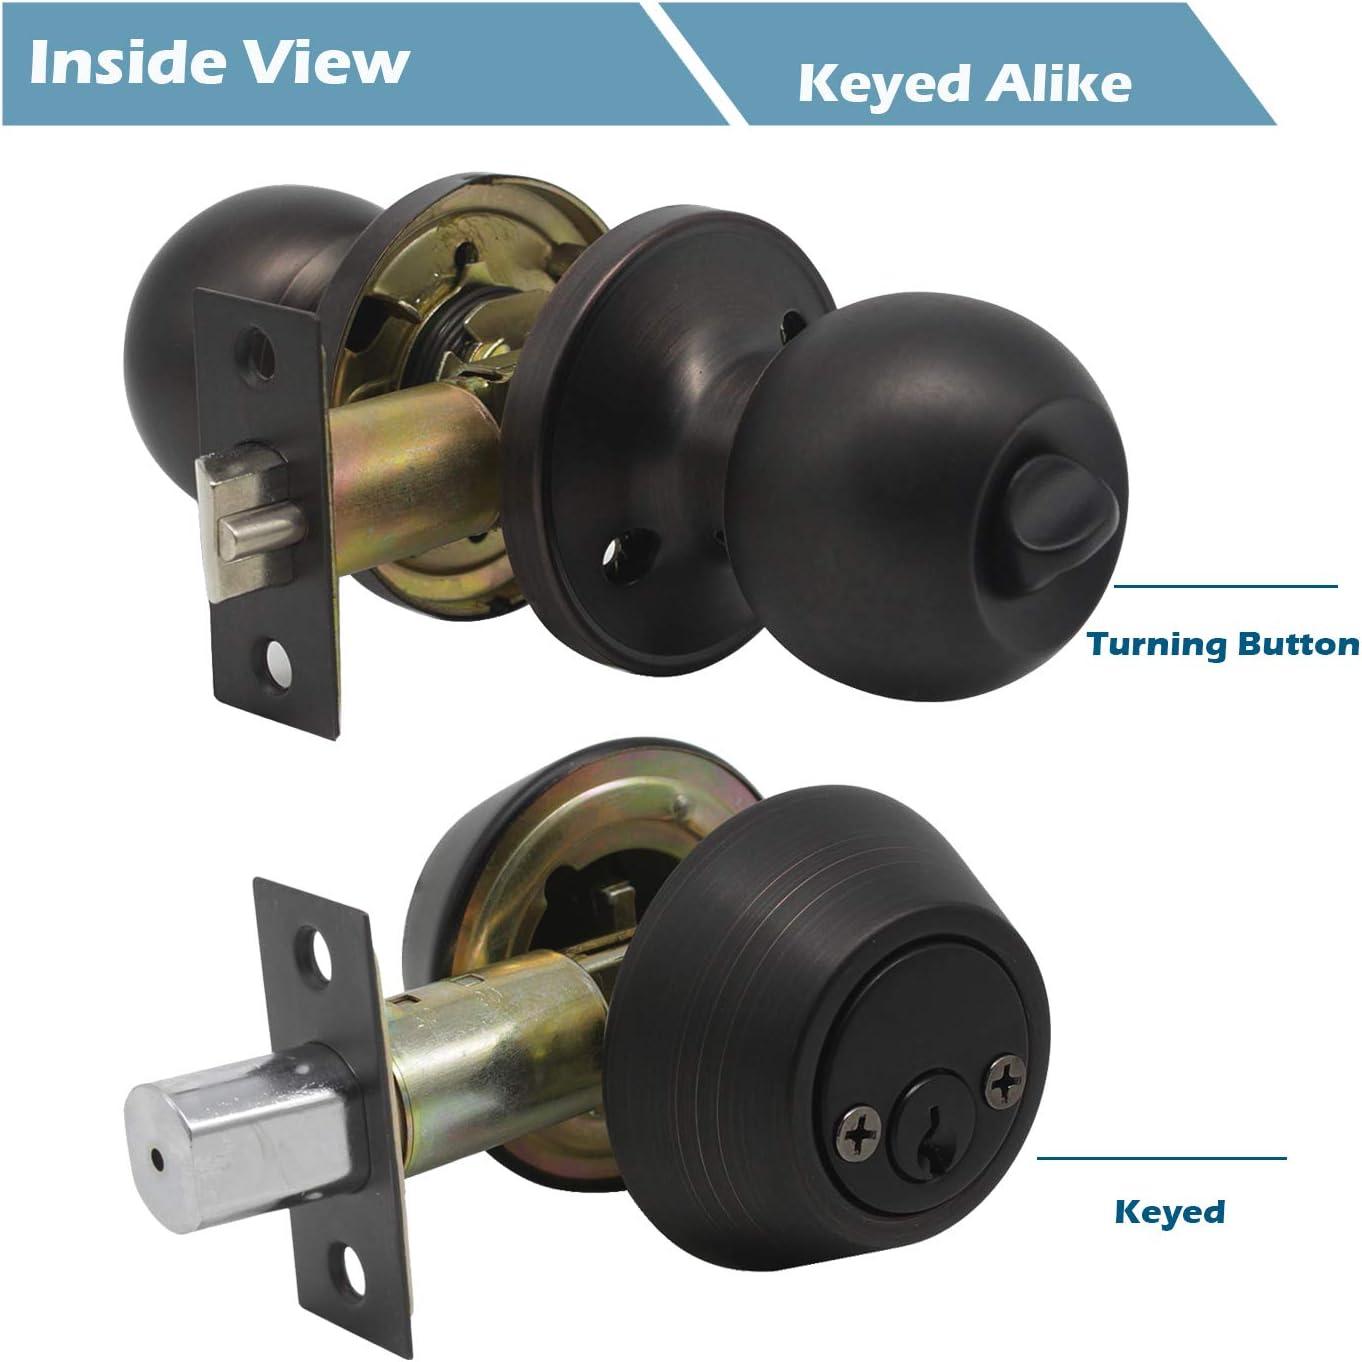 Gobrico Oil Rubbed Bronze Keyed-Alike Round Ball Entry Door Knob Lockset and Double Cylinder Deadbolt 1Pack Keyed on Both Side